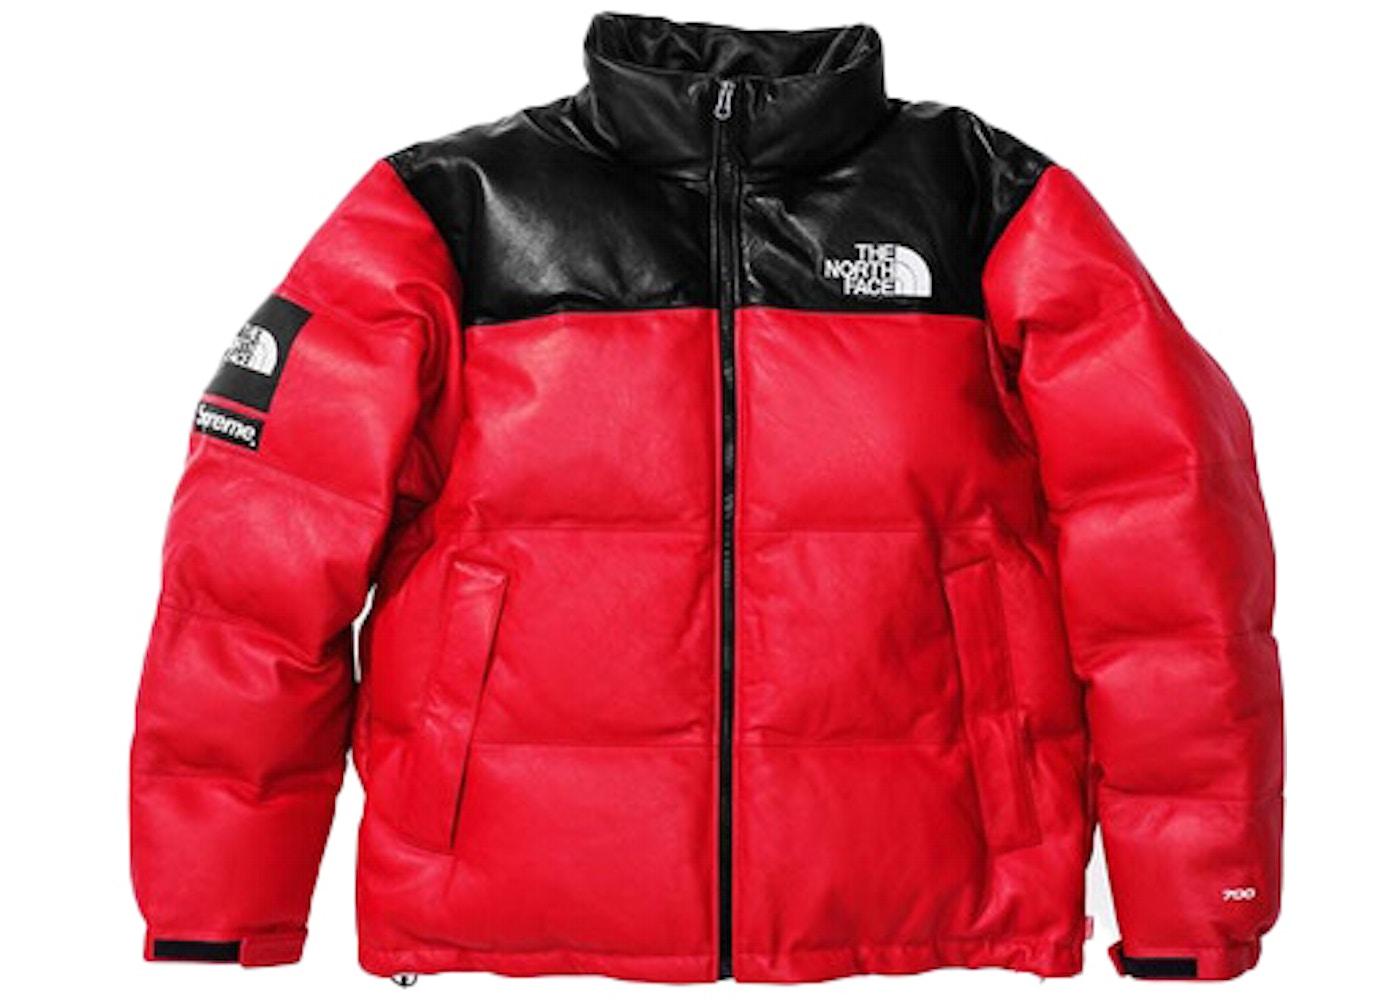 db9308449 Streetwear - Supreme Jackets - Average Sale Price